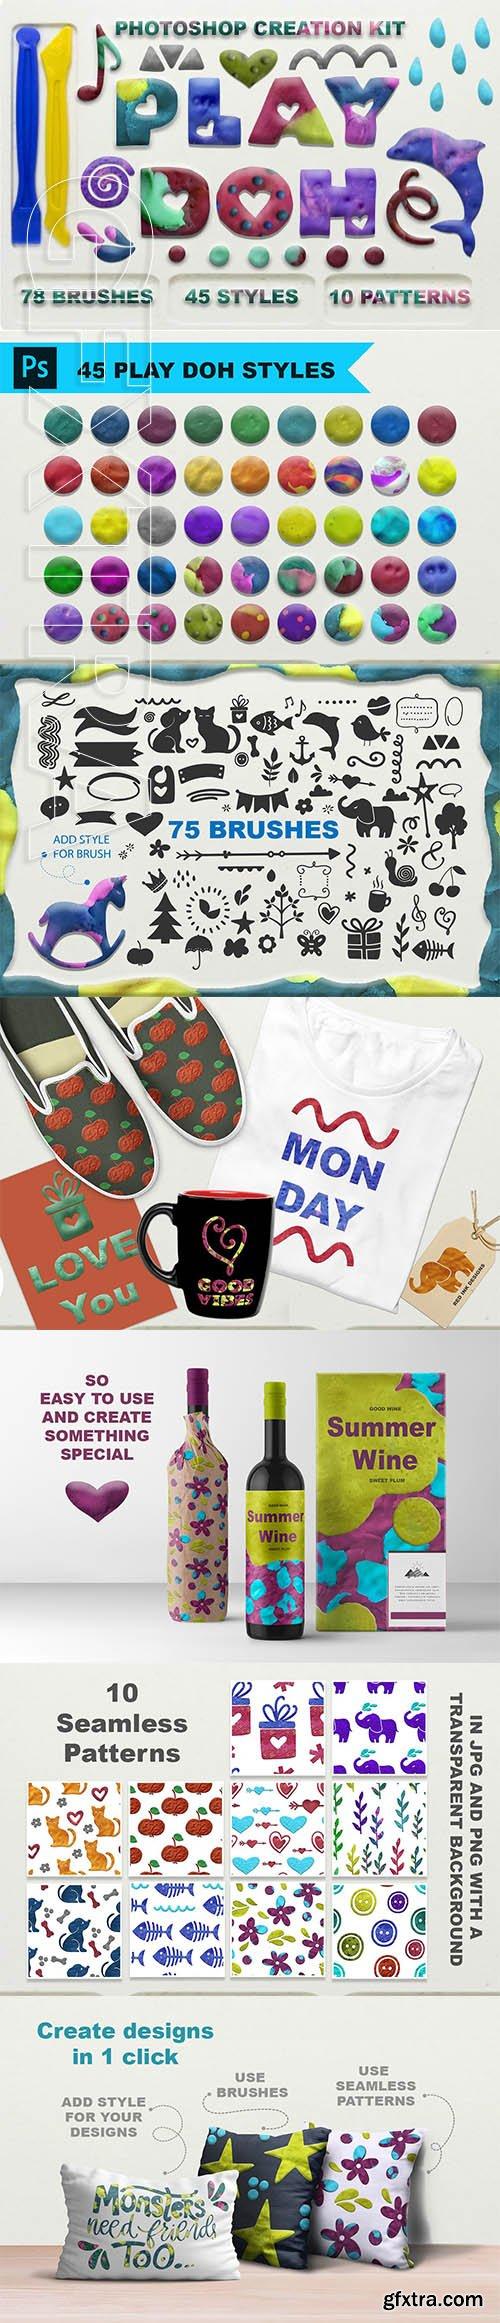 CreativeMarket - Play Doh Photoshop creation kit 3258463